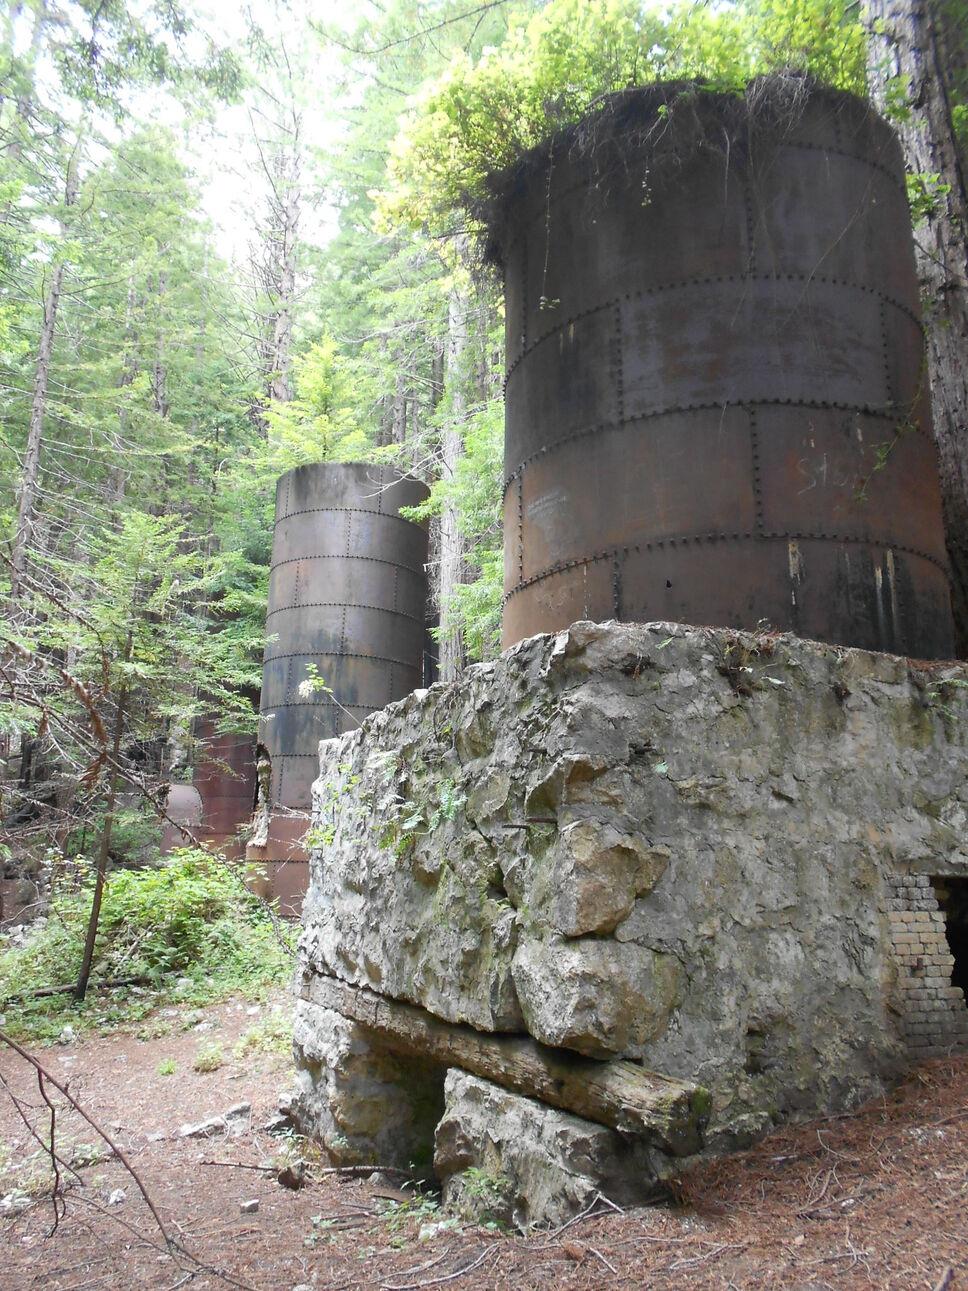 National Parks Blog: Lime Kilns Limekiln State Park California